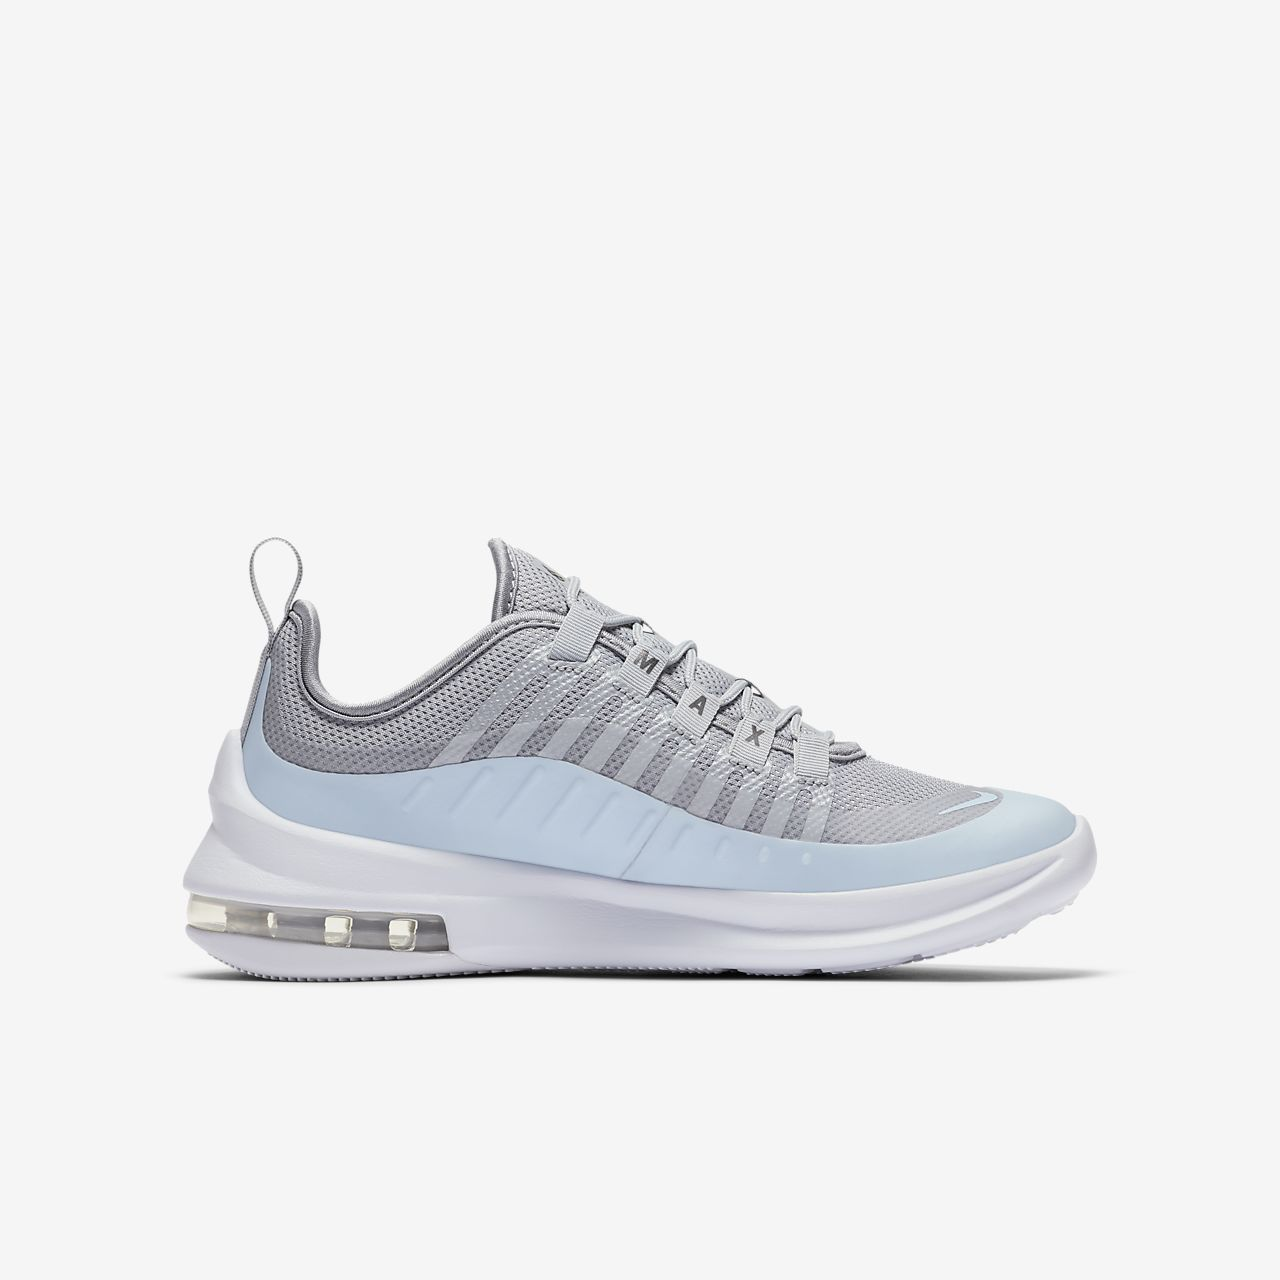 Nike AIR MAX AXIS sneakers Gray